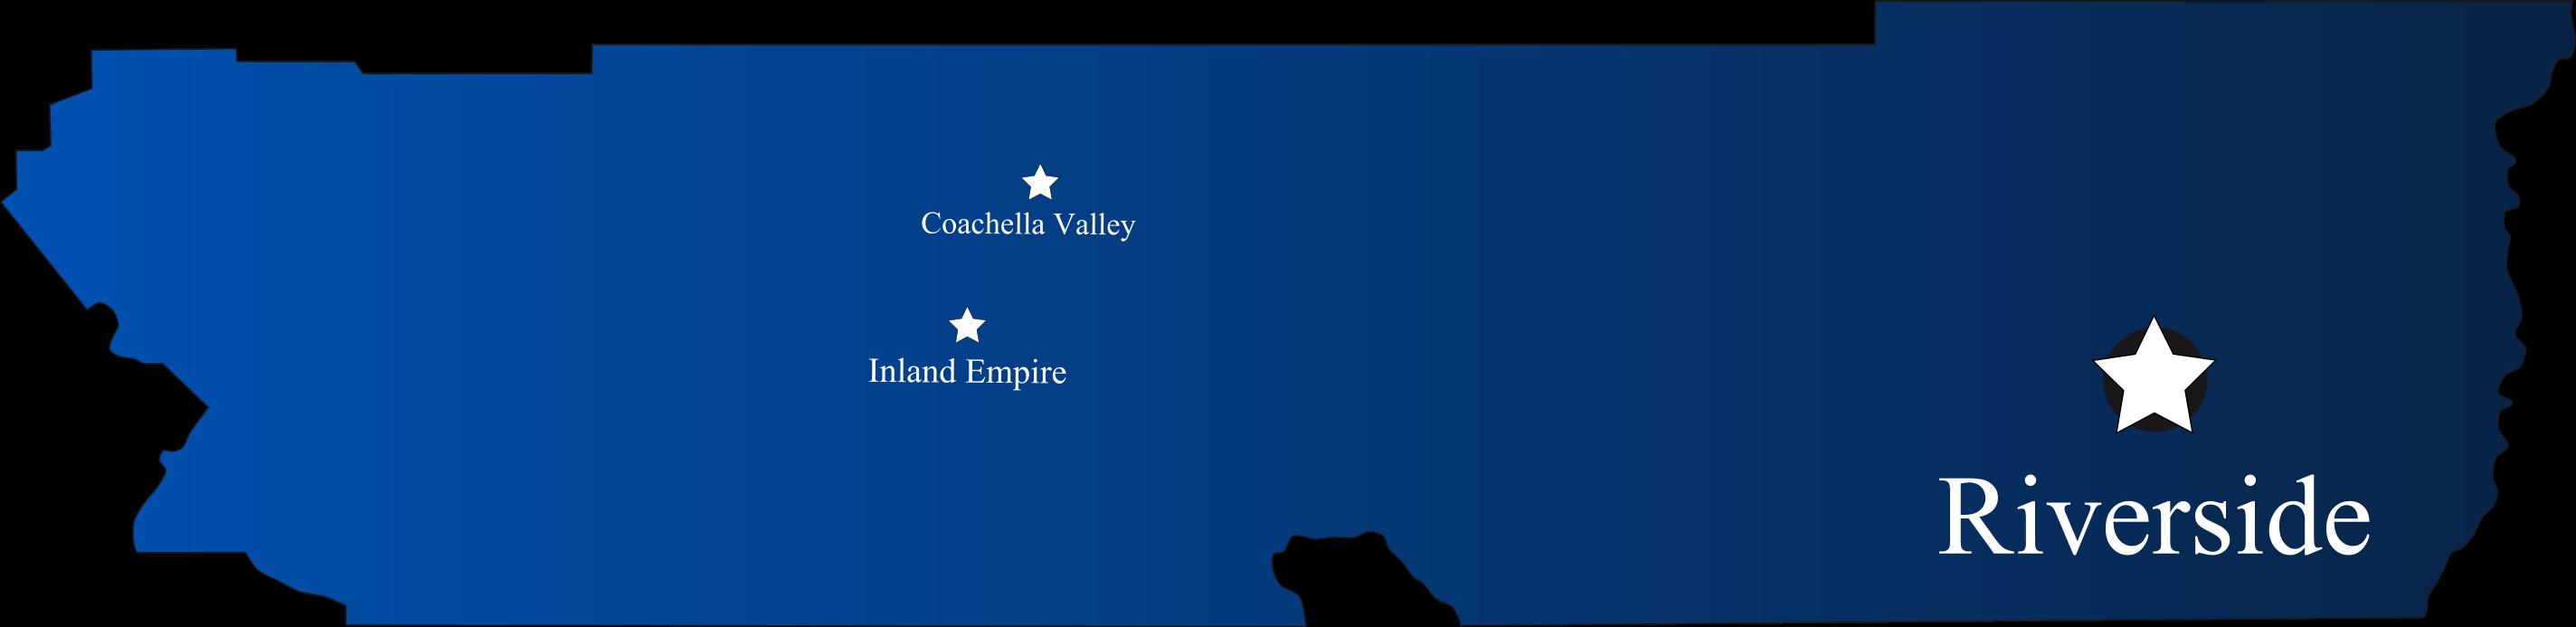 Coachella Valley and Inland Empire map